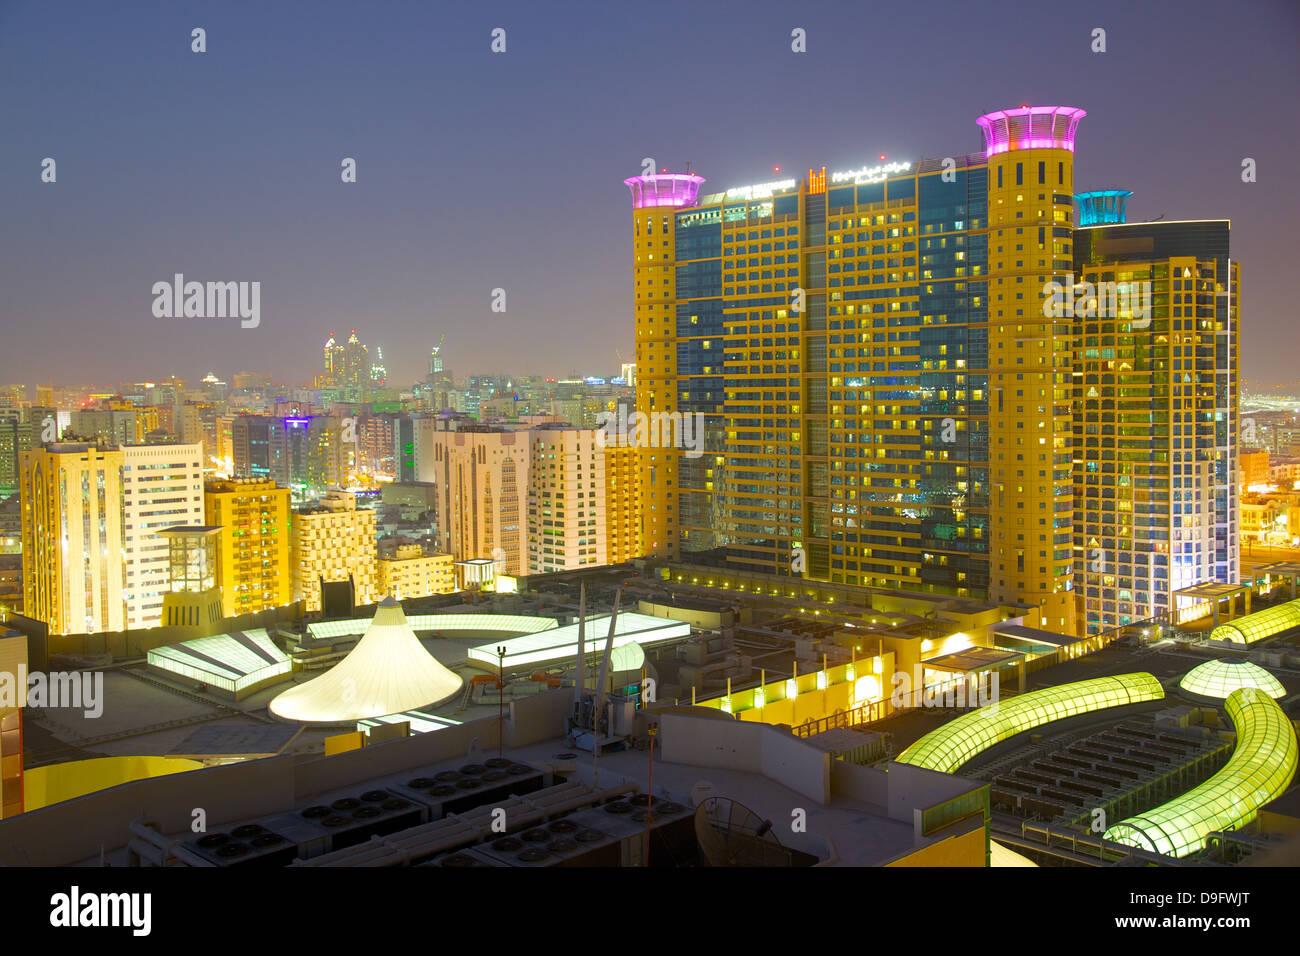 Grand Millennium Hotel and Al Wahda Mall at dusk, Abu Dhabi, United Arab Emirates, Middle East - Stock Image